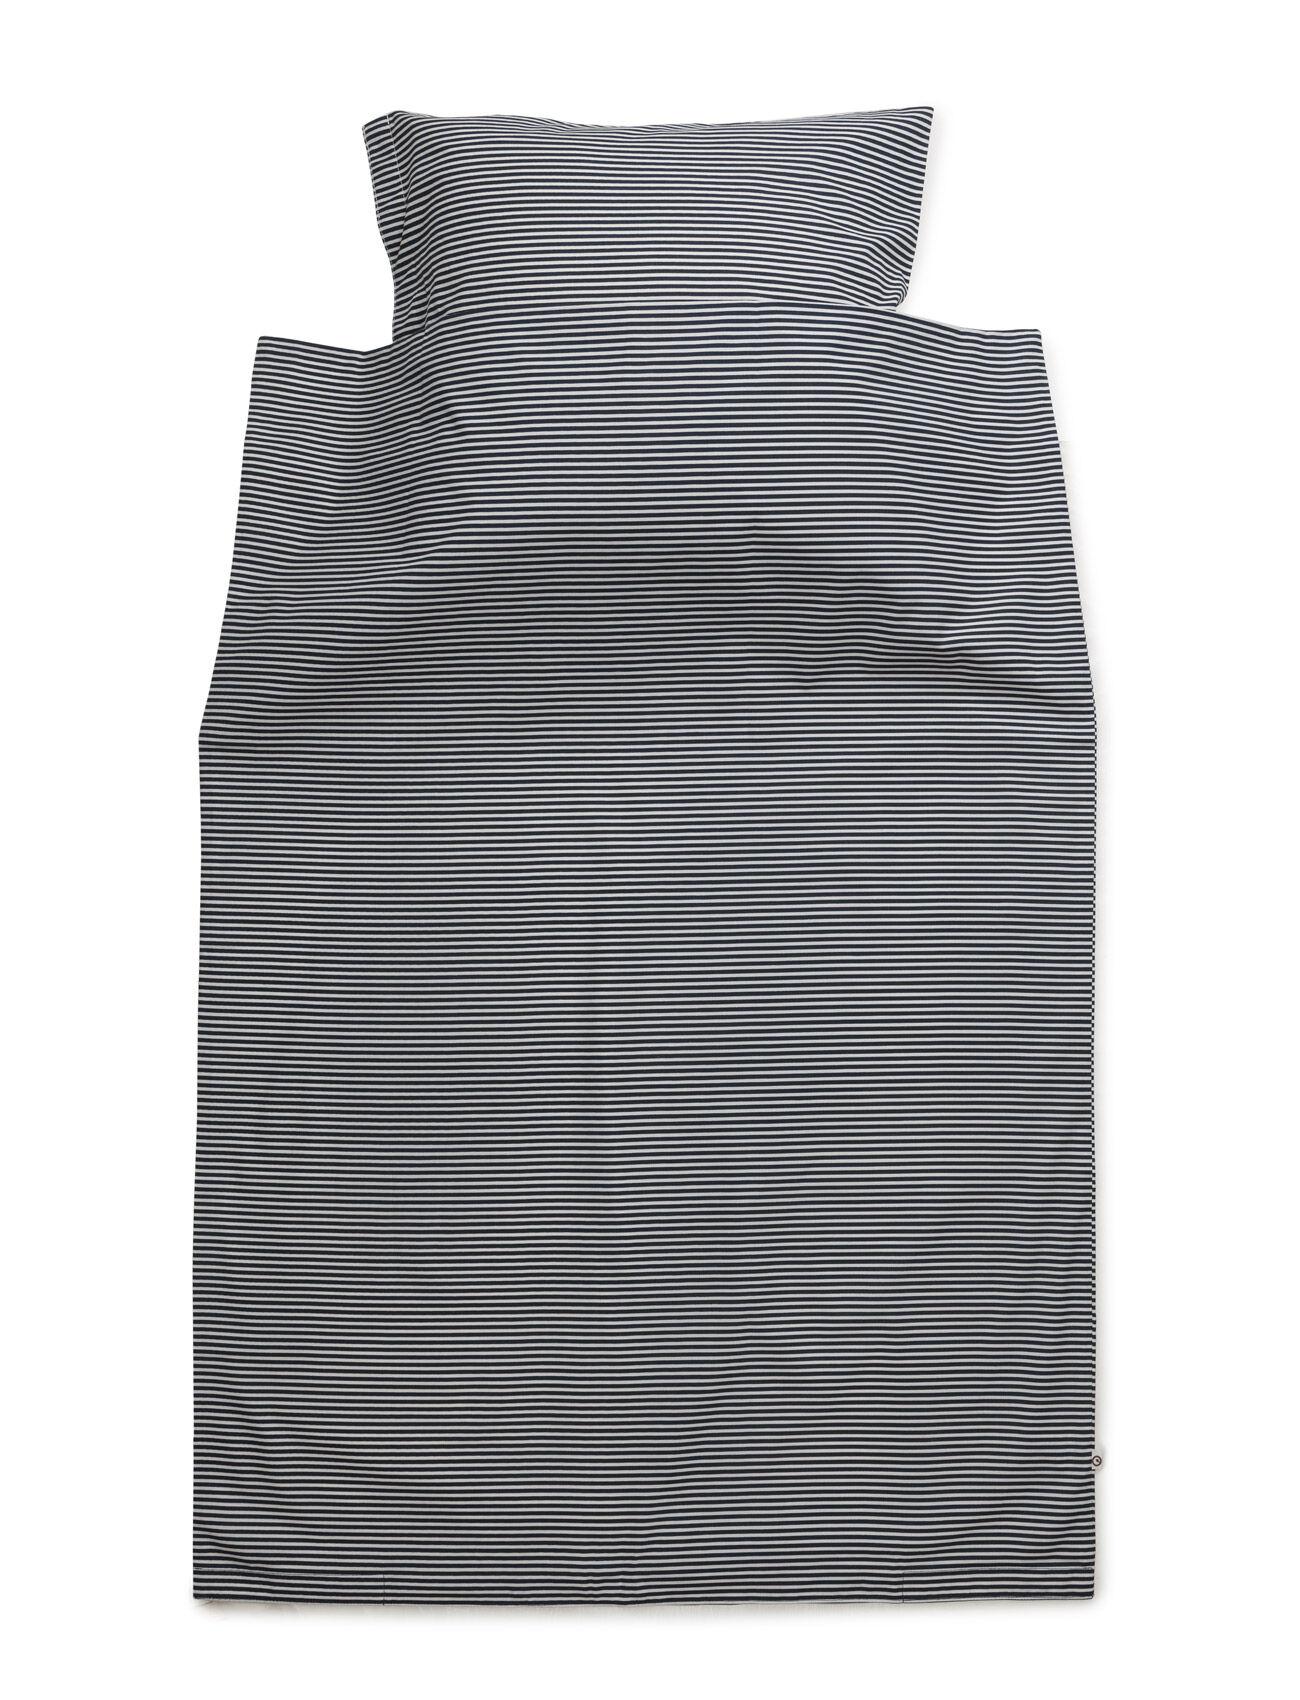 Müsli by Green Cotton Stripe Bed Linen Baby